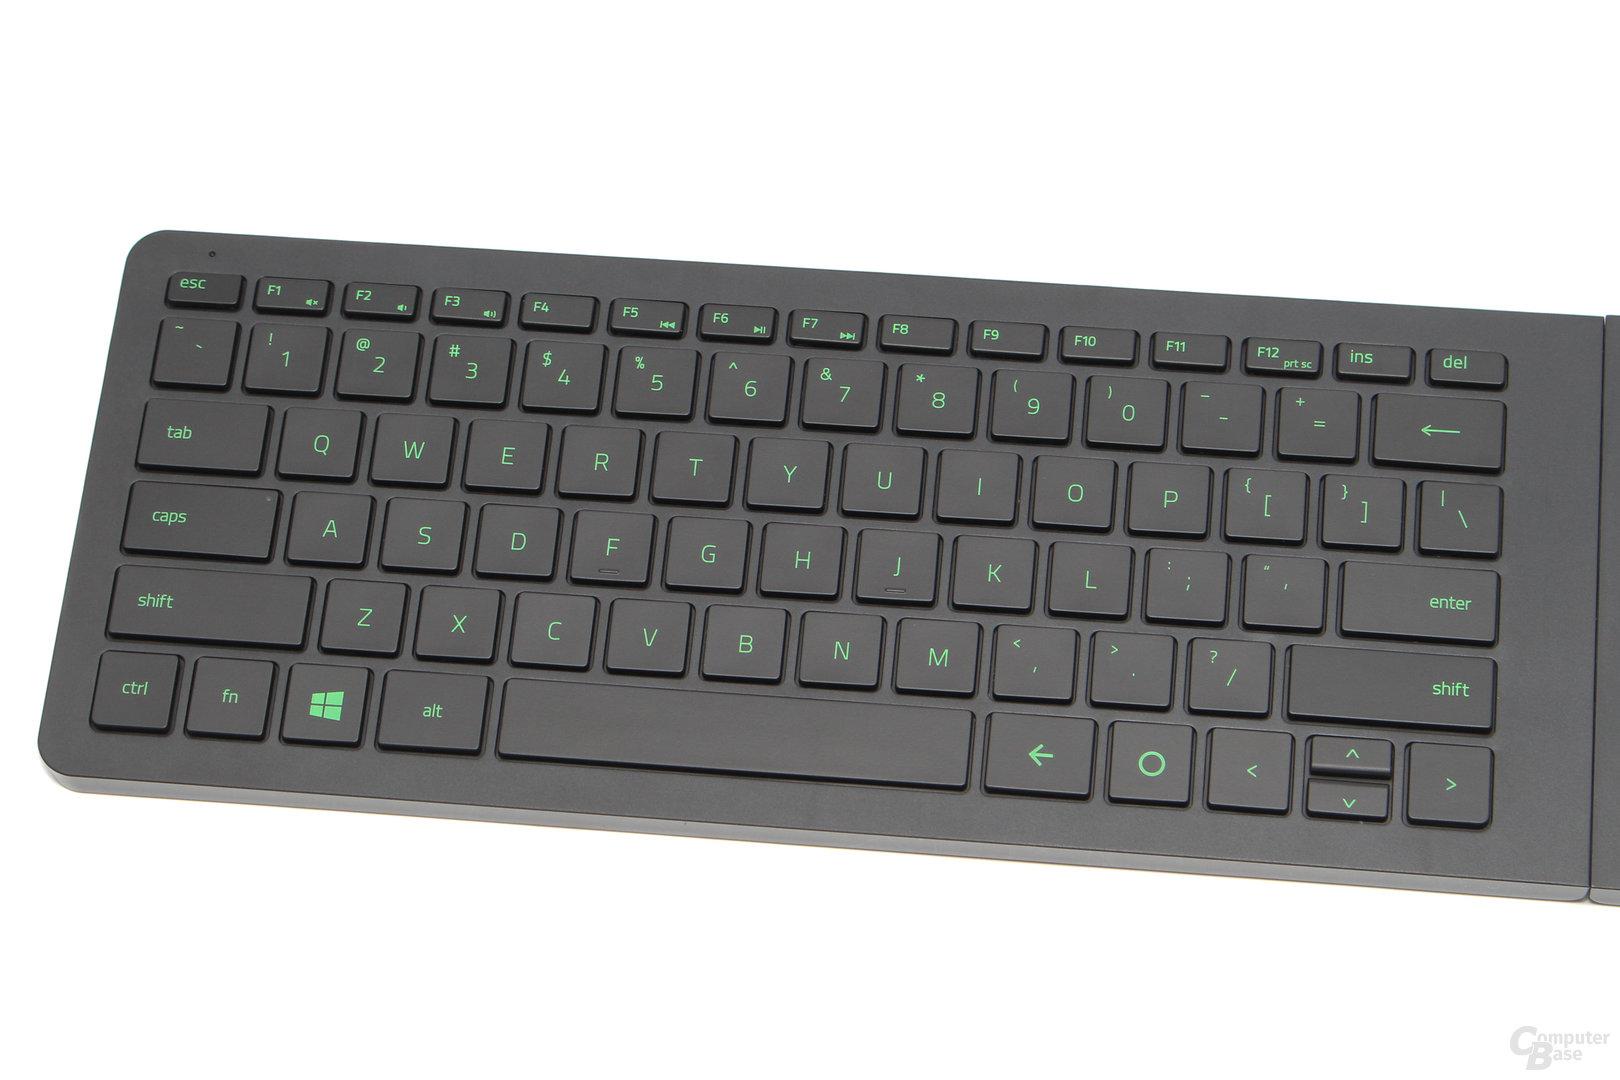 Das kompakte Tastaturmodul verfügt über 77 Tasten